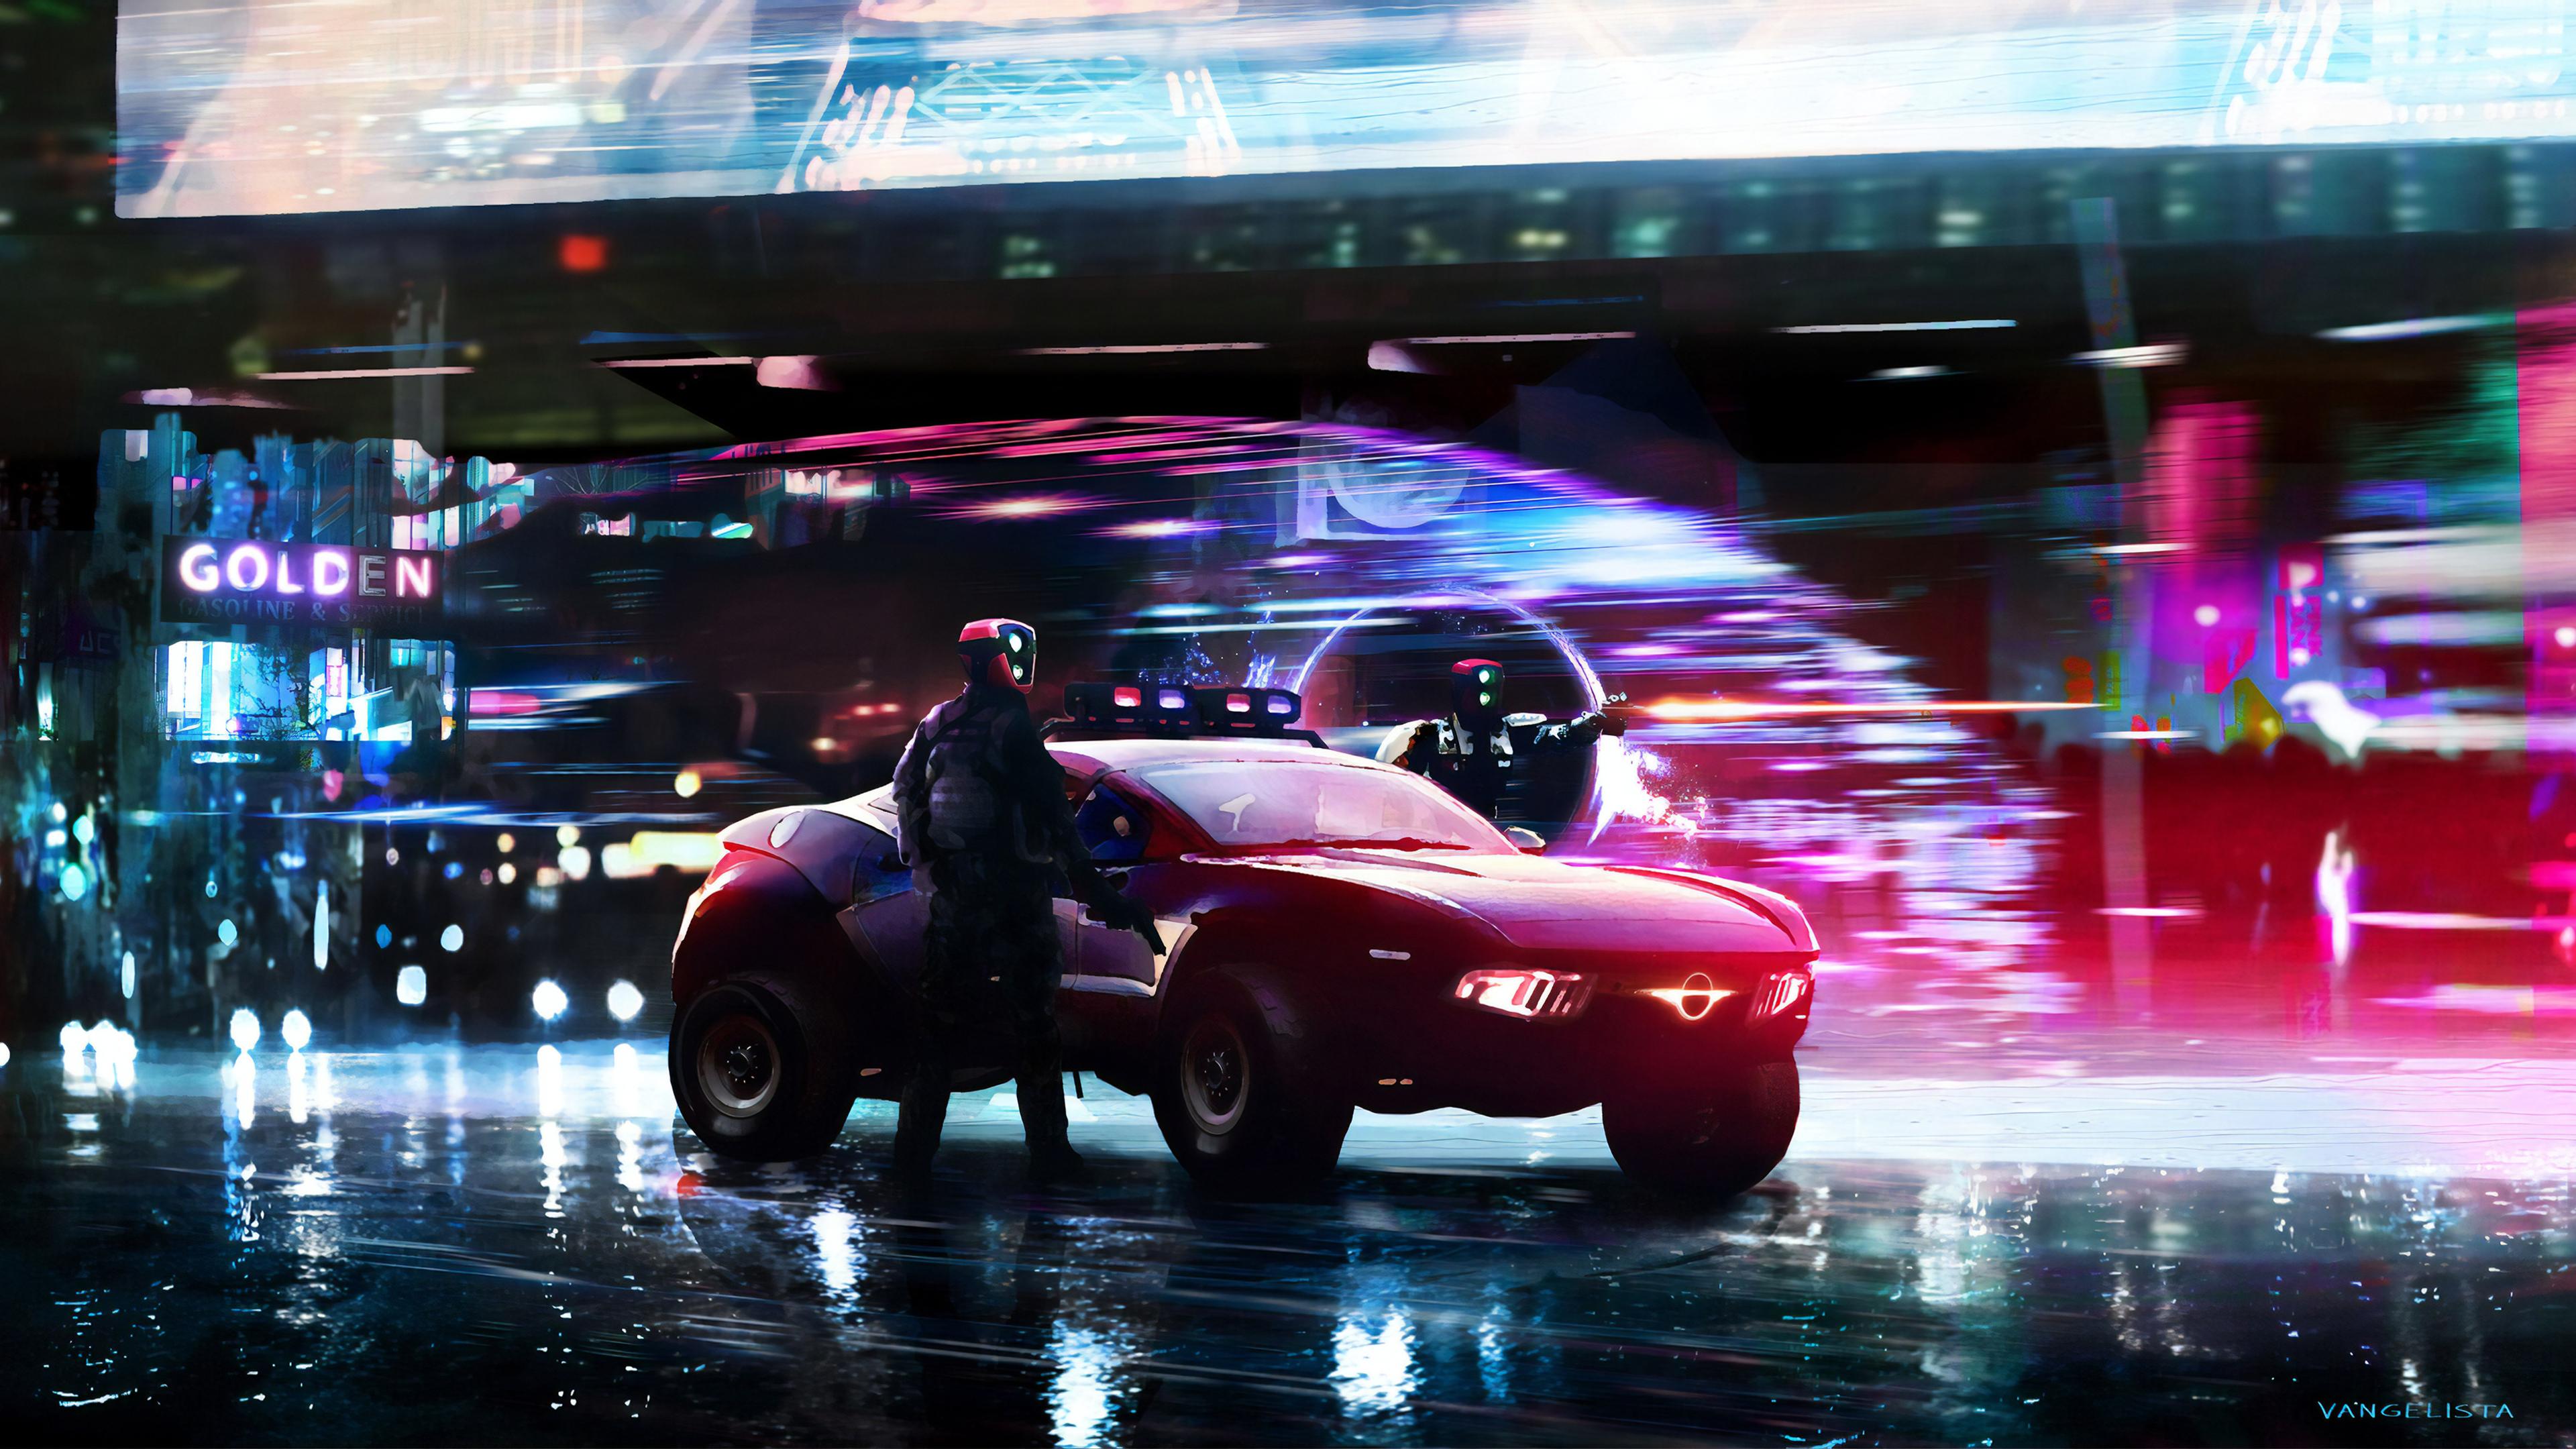 cyberpunk police cars 1563222197 - Cyberpunk Police Cars - hd-wallpapers, digital art wallpapers, cyberpunk wallpapers, artwork wallpapers, artist wallpapers, 4k-wallpapers